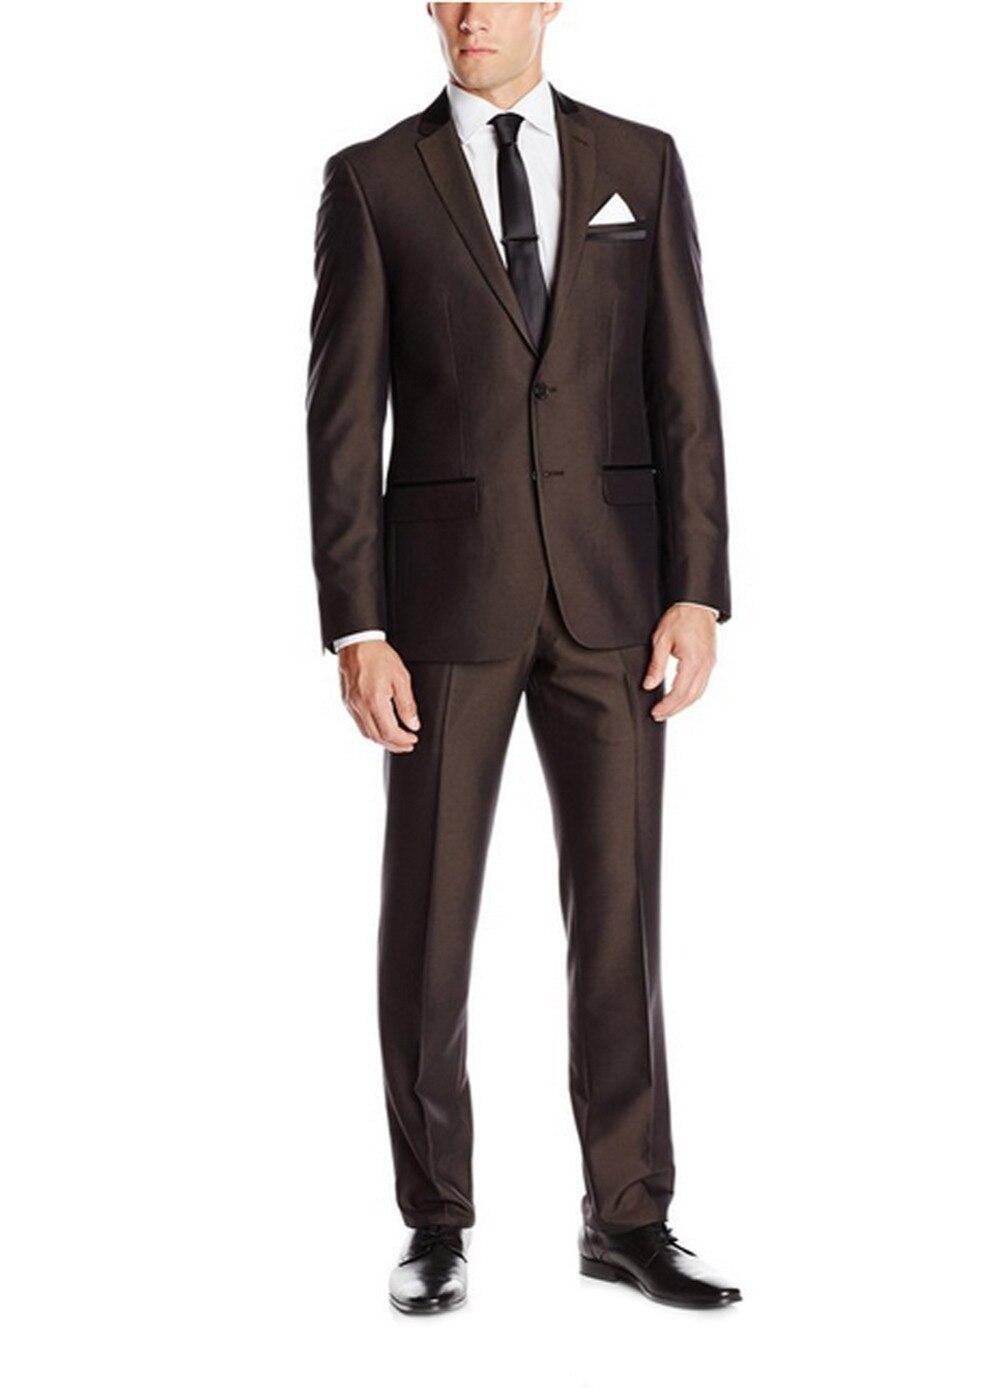 Online Get Cheap Dark Brown Suit -Aliexpress.com | Alibaba Group